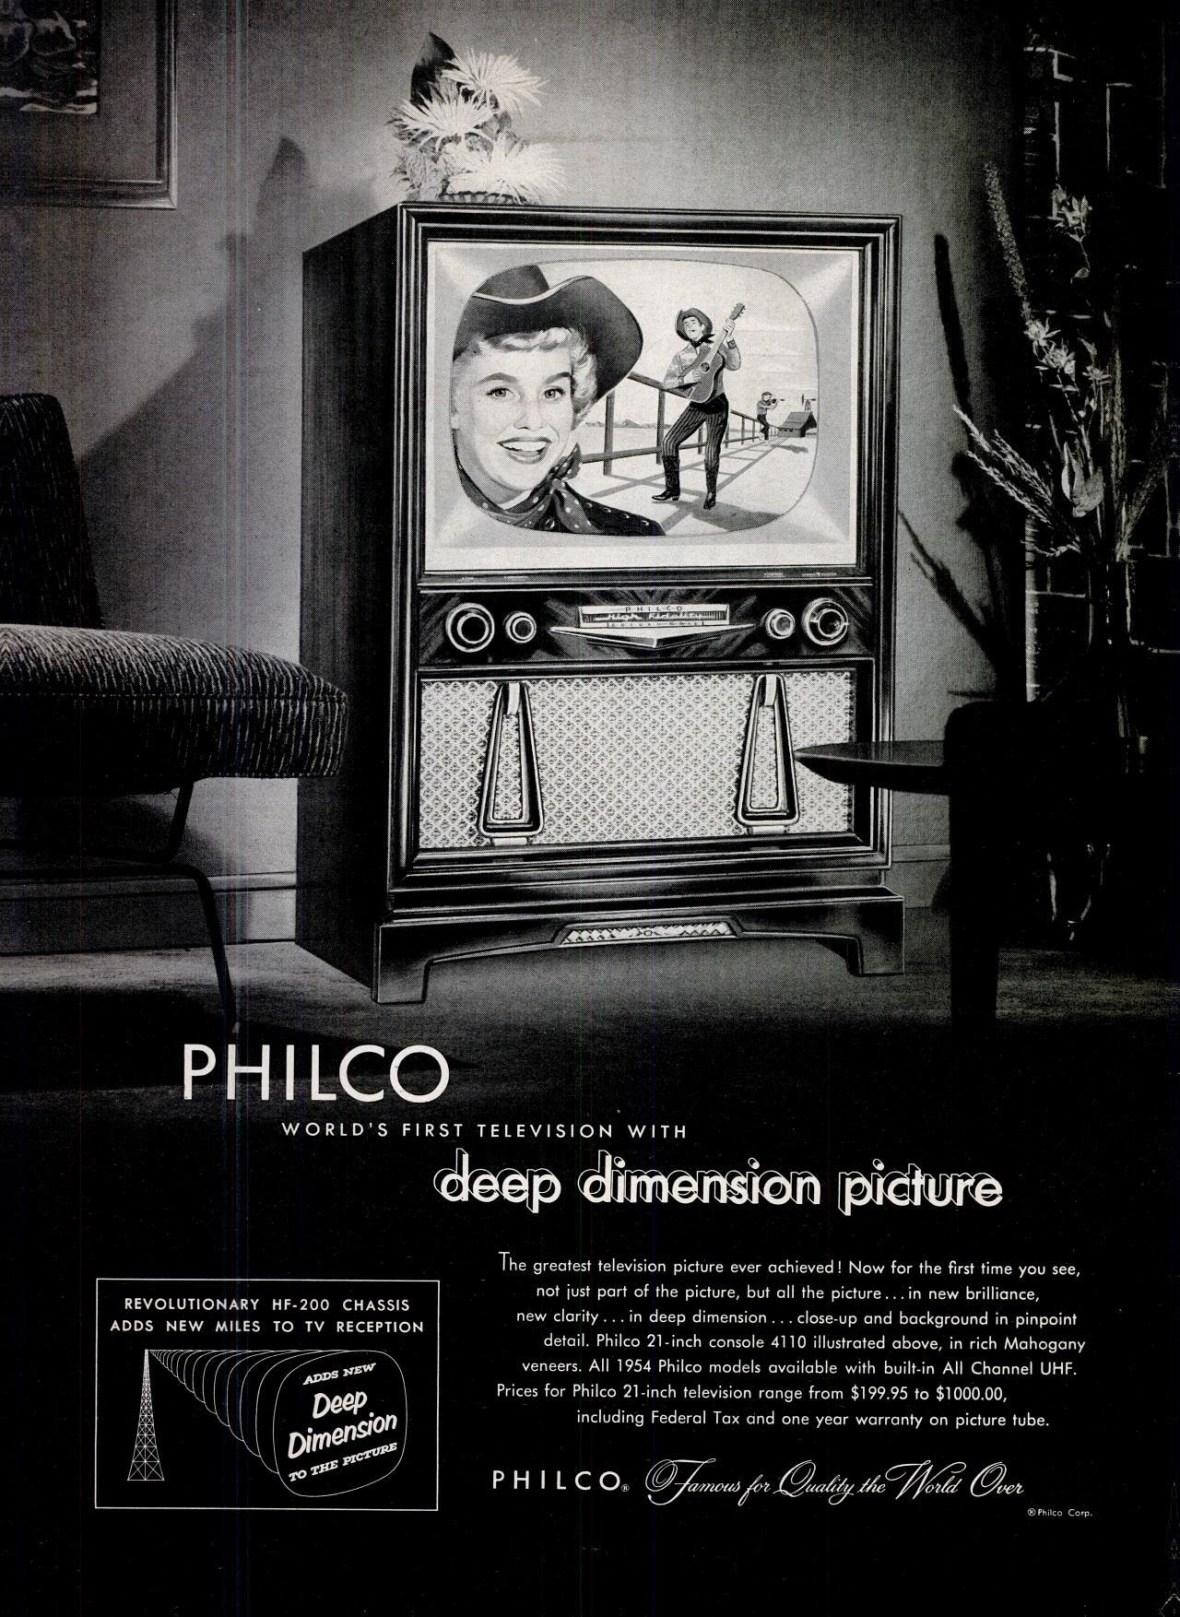 Philco - 1954